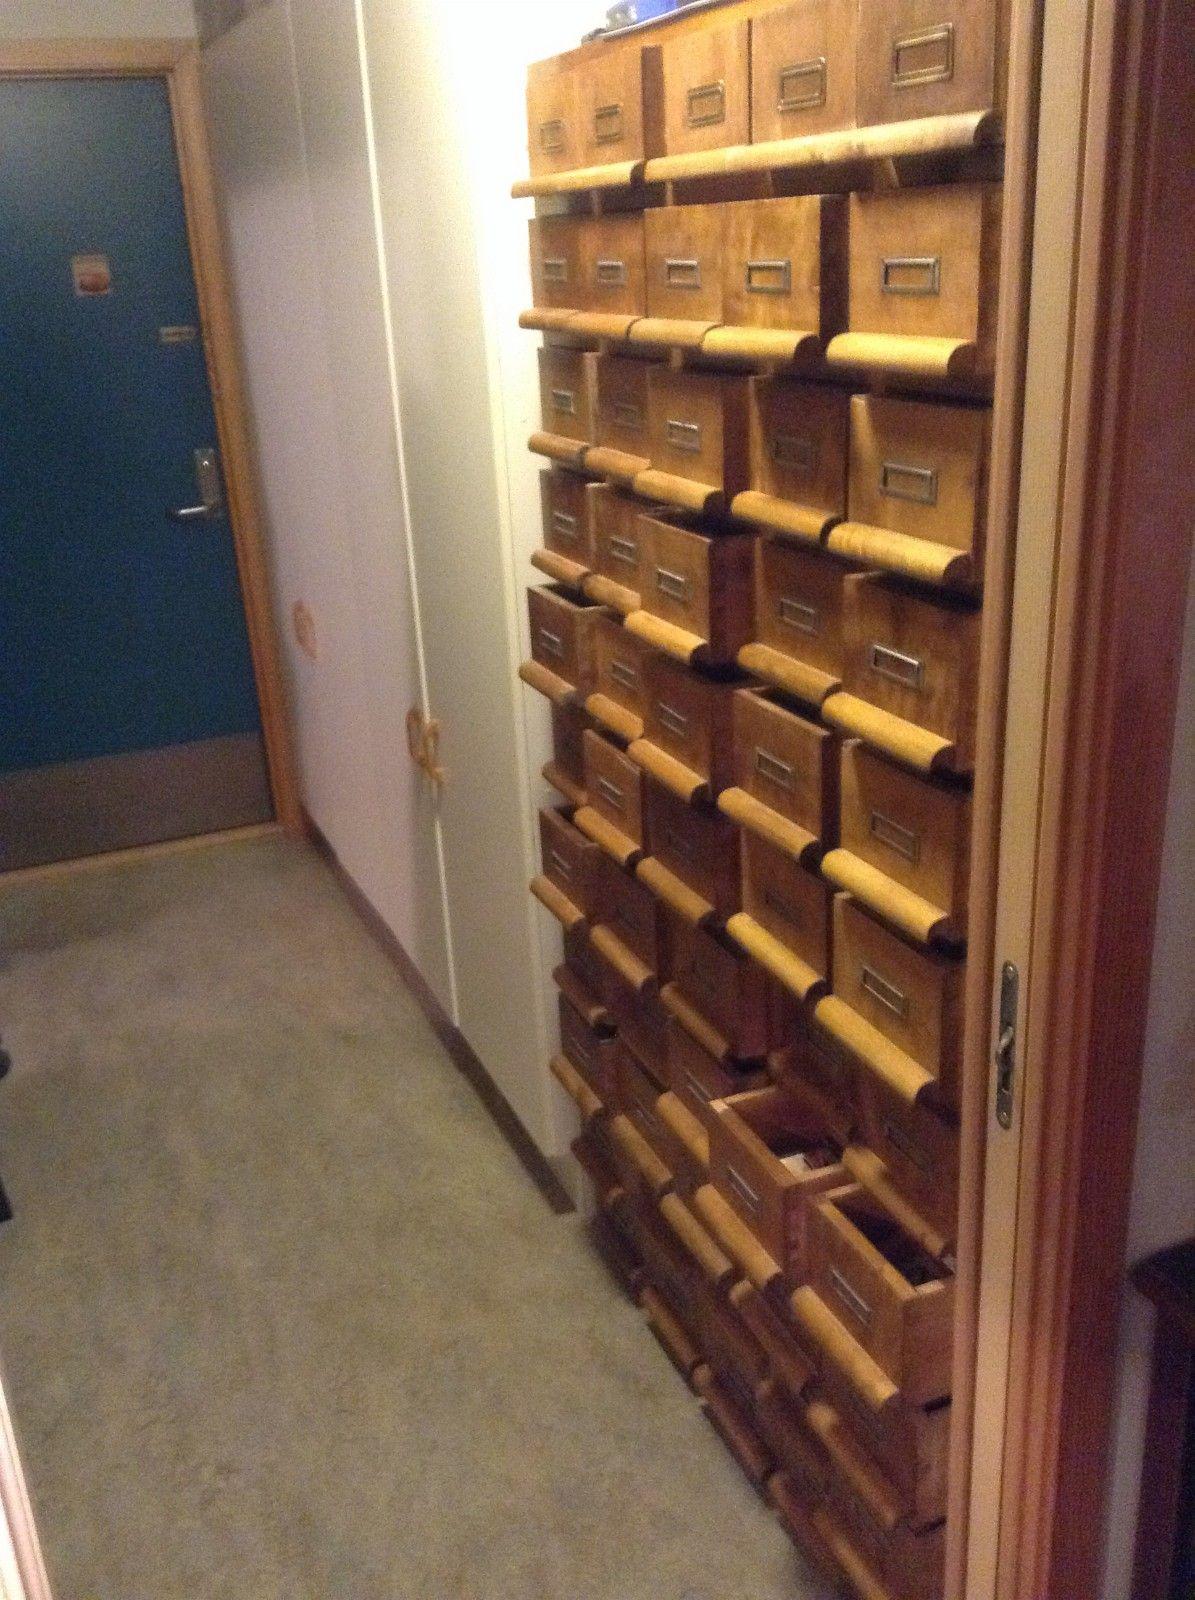 FINN – Antik arkiv skap 54 skuffer 1900 tall